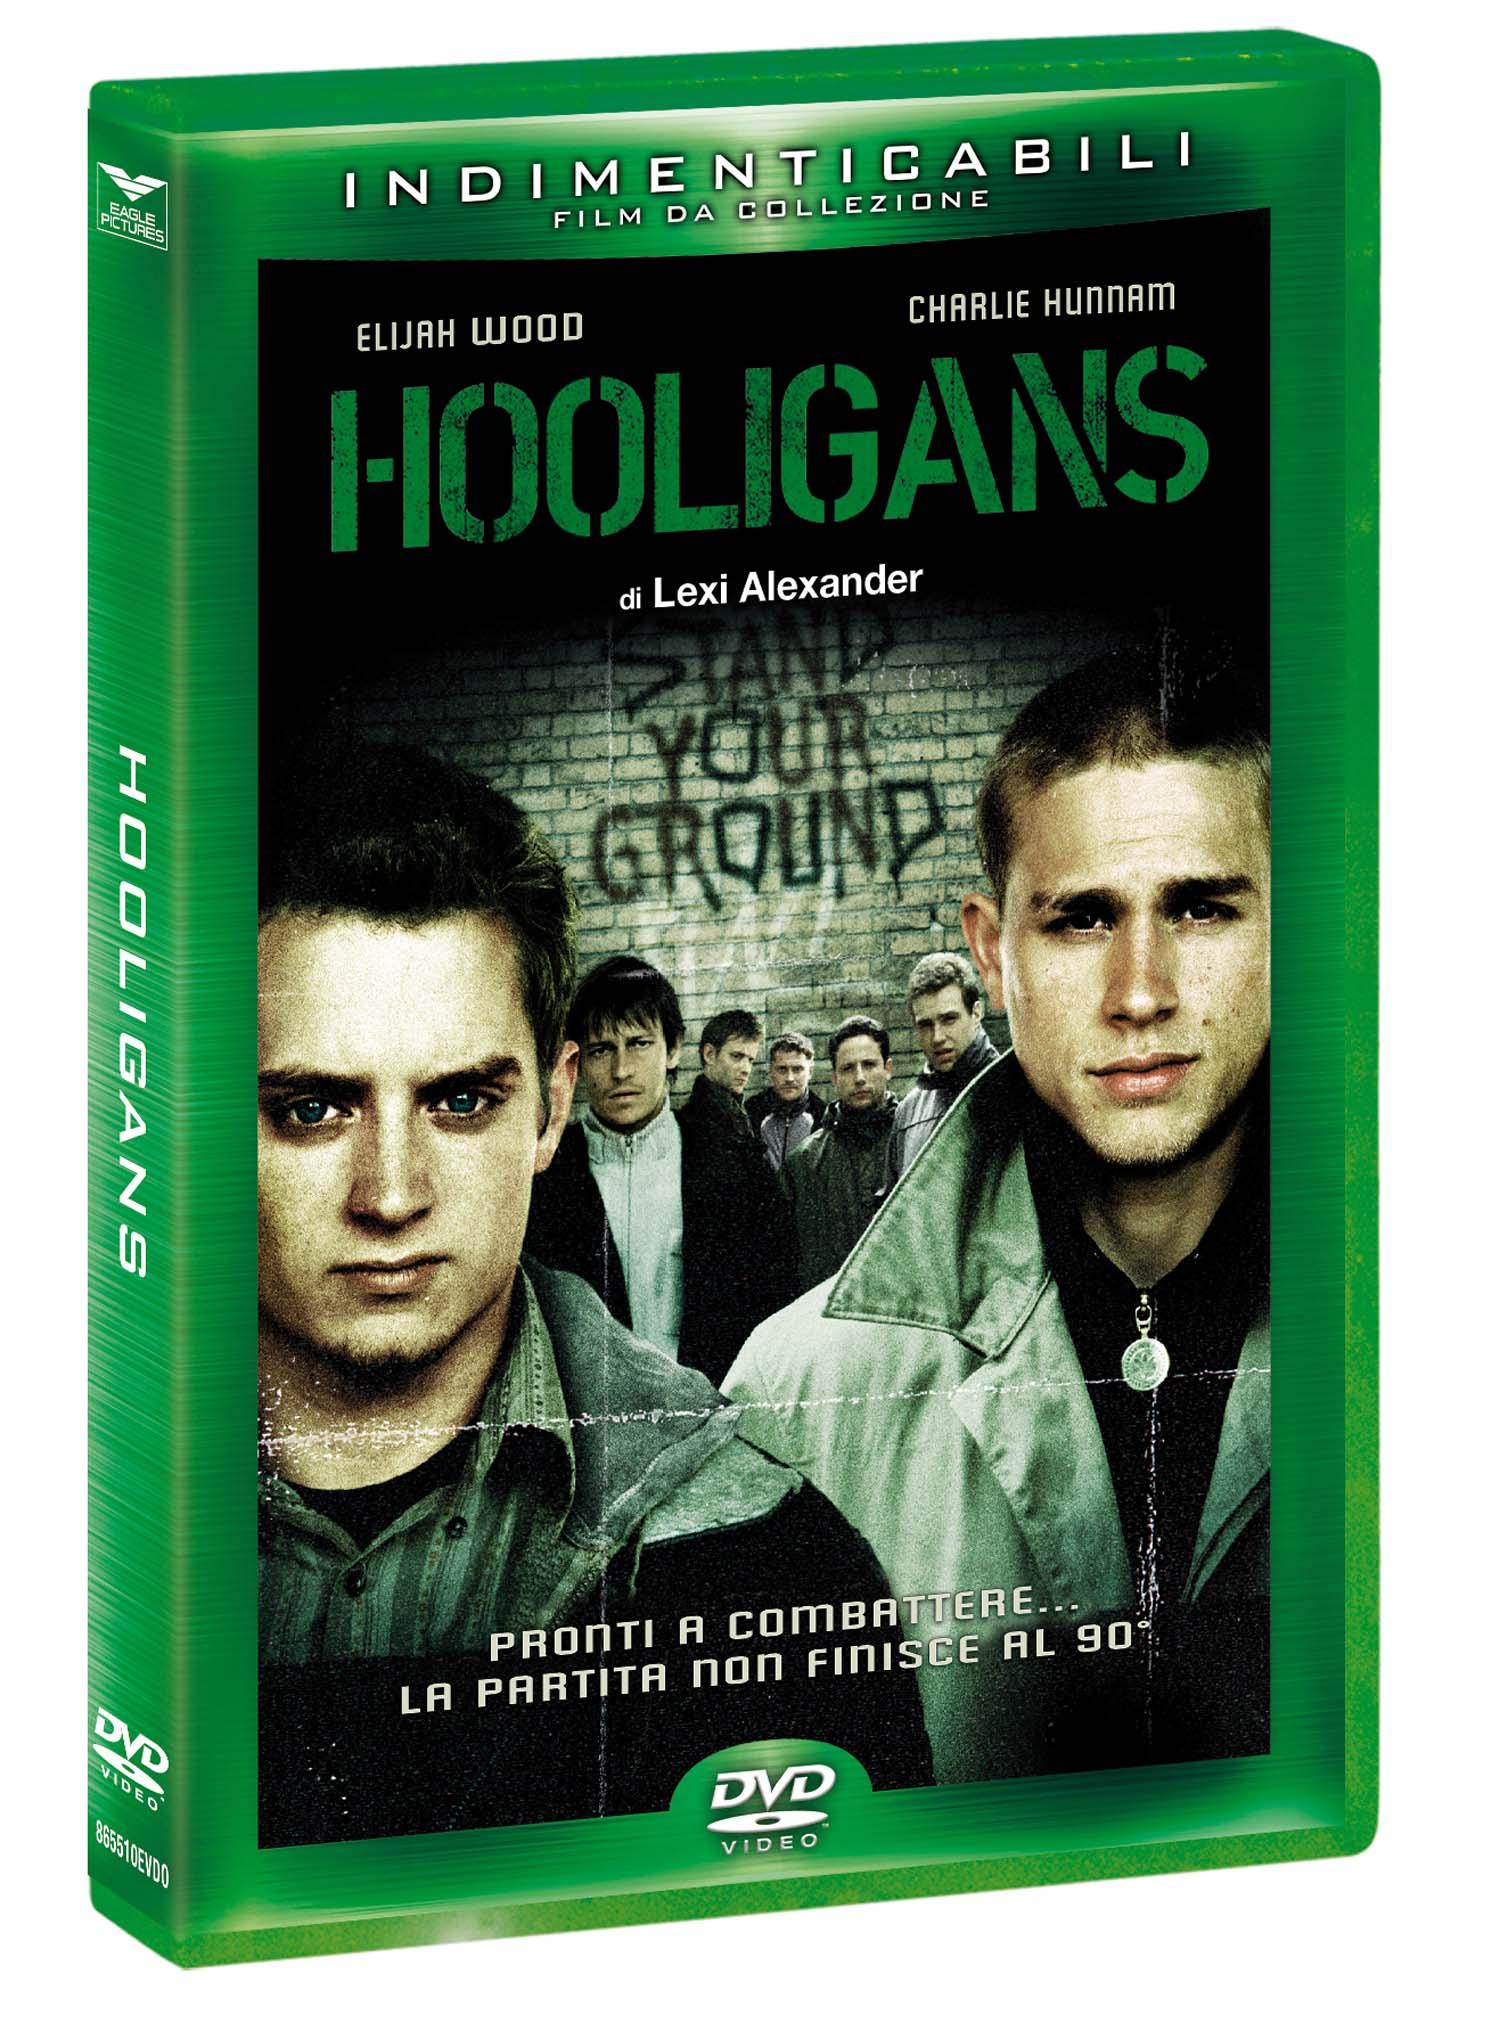 HOOLIGANS (INDIMENTICABILI) (DVD)